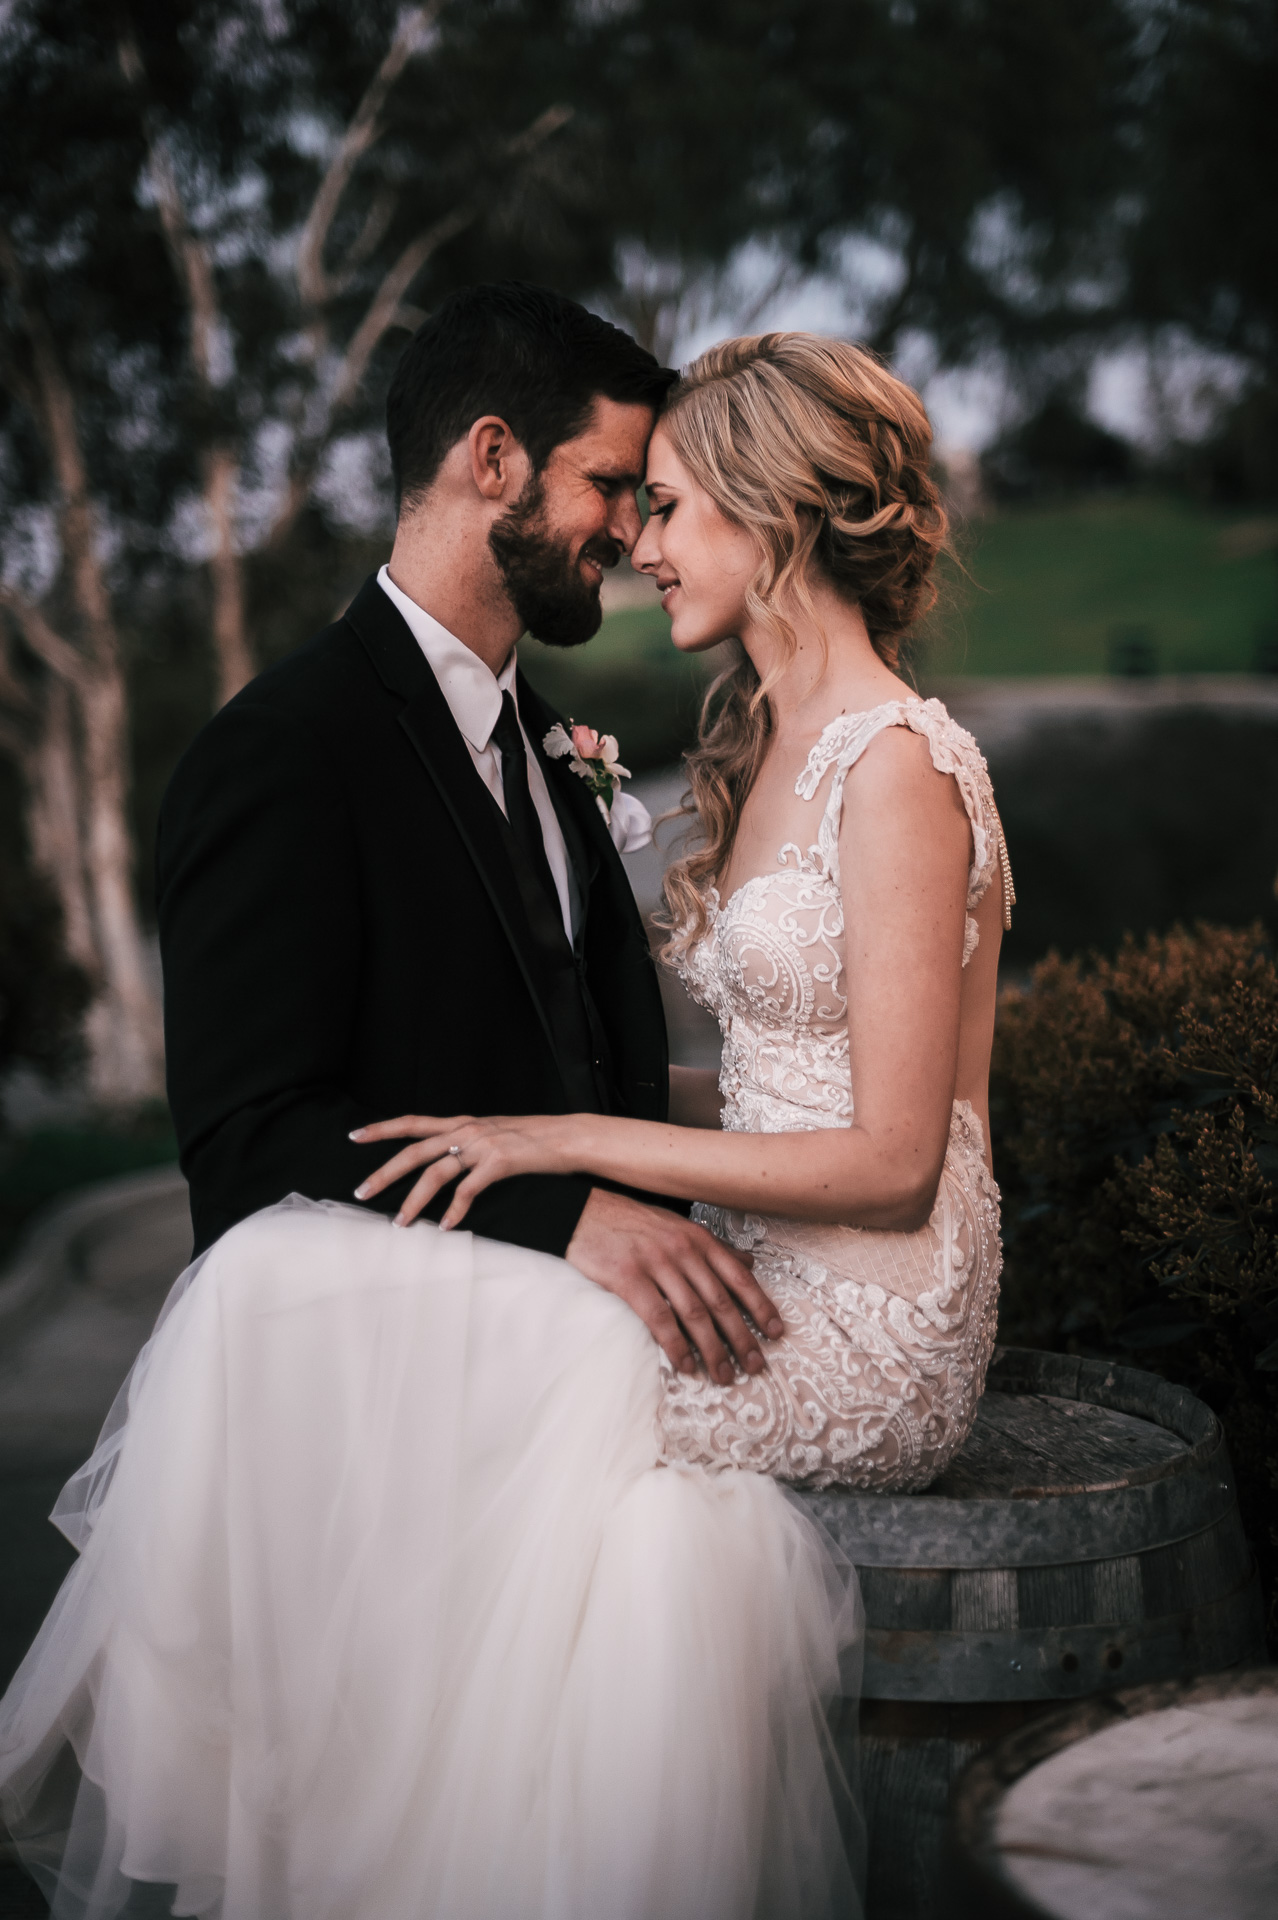 romantic wedding photography at the Twin Oaks Golf Course in San Marcos, San Diegos premier wedding venue